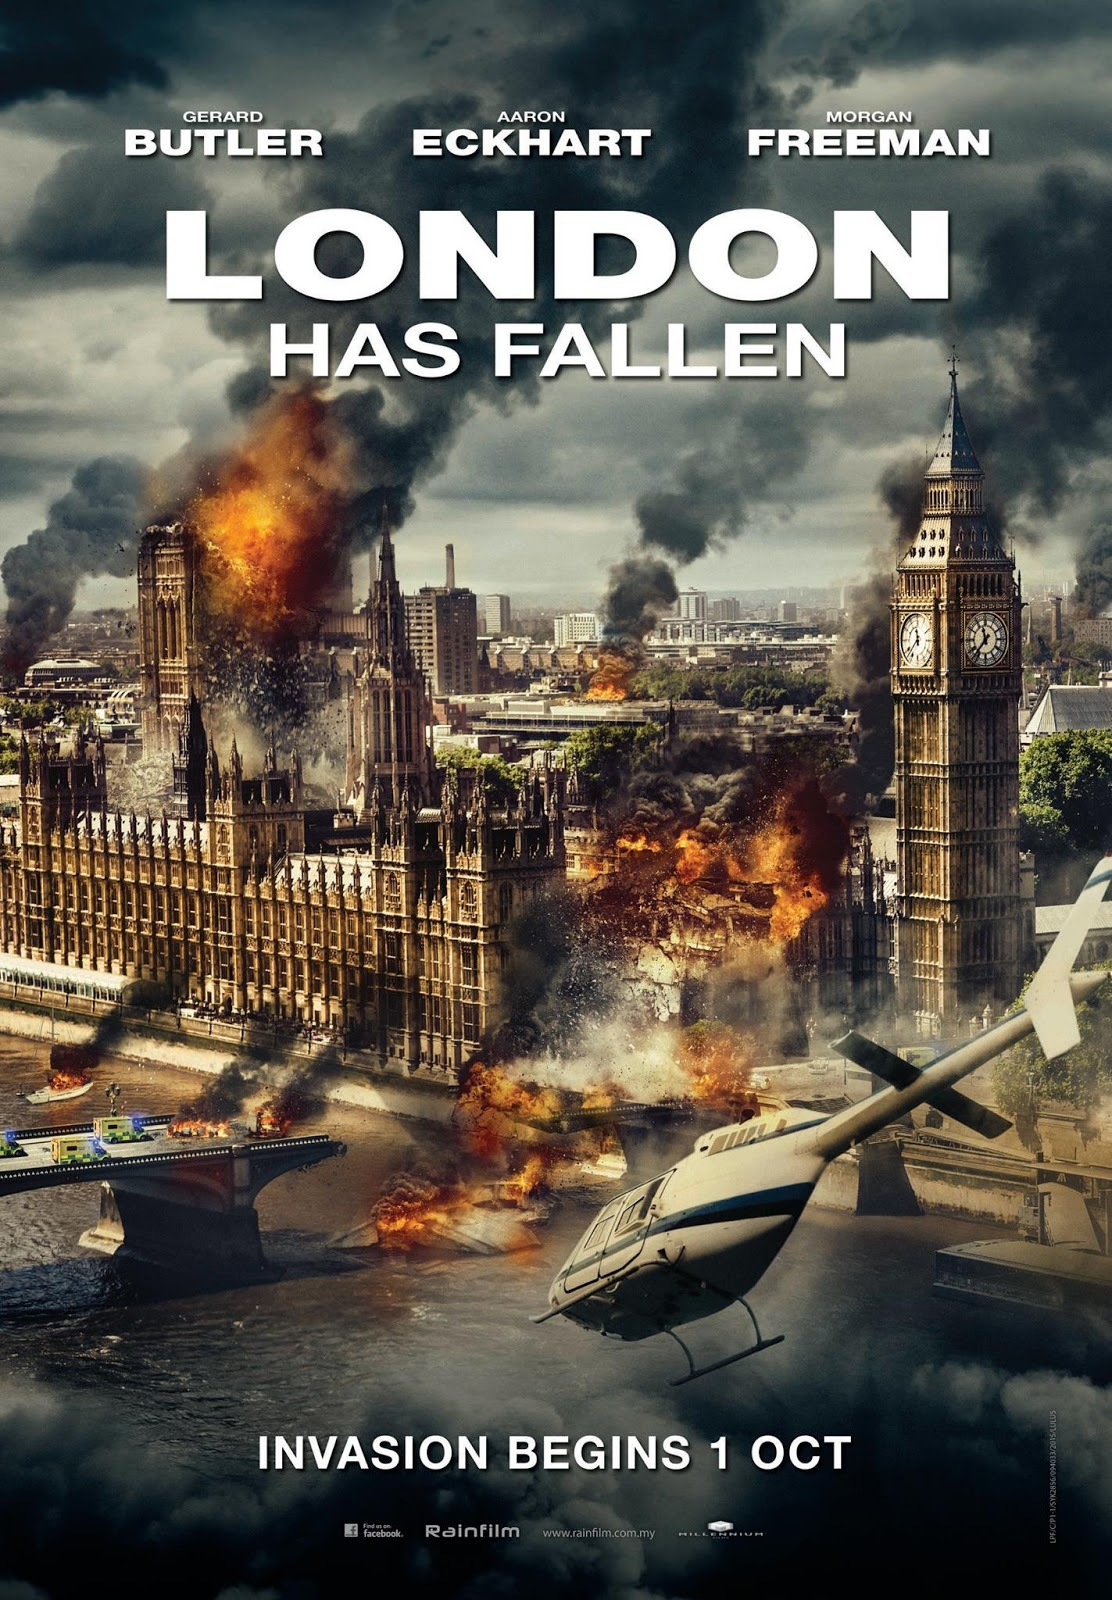 LONDON HAS FALLEN (2016) ผ่ายุทธการถล่มลอนดอน [ZOOM V.1 เสียงไทยโรง]